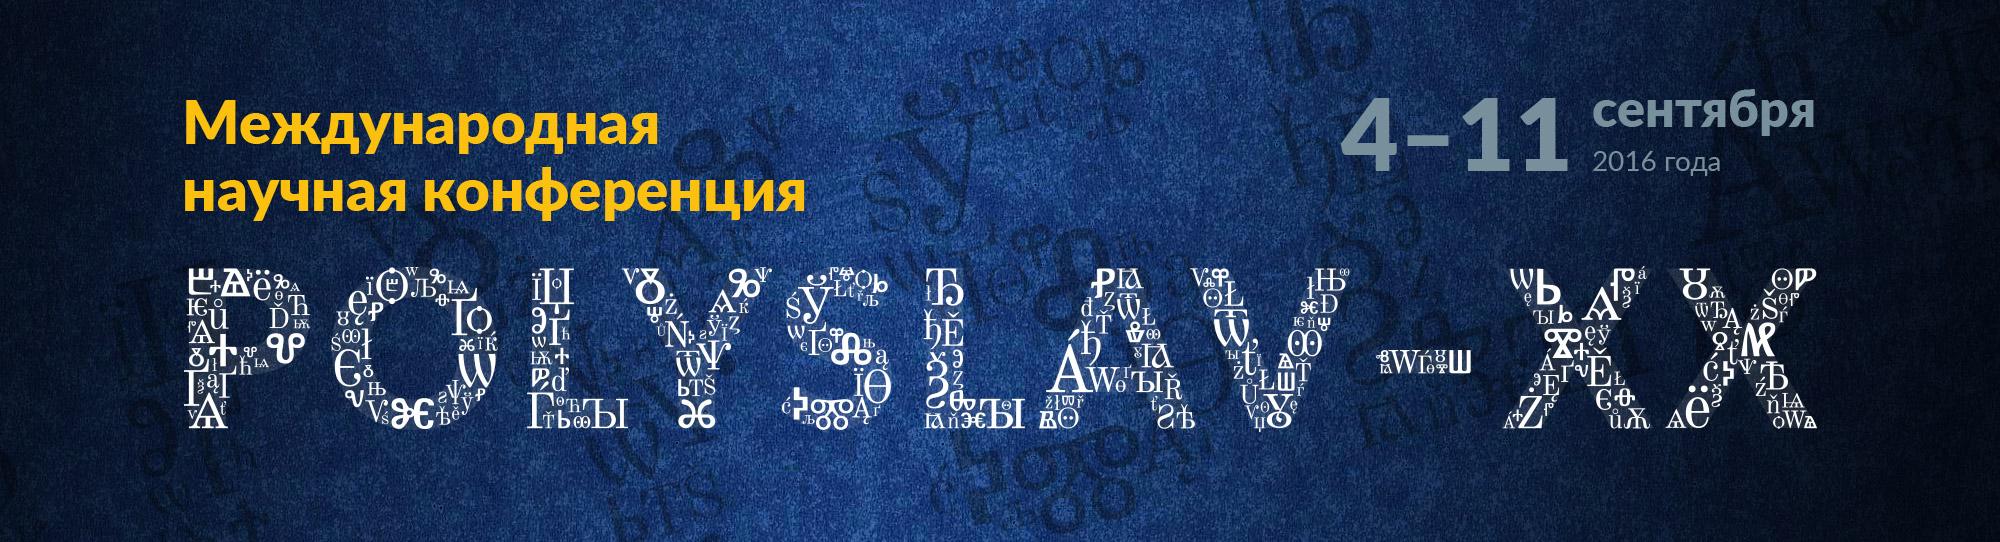 mpgu-site-big-banner-POLYSLAV2